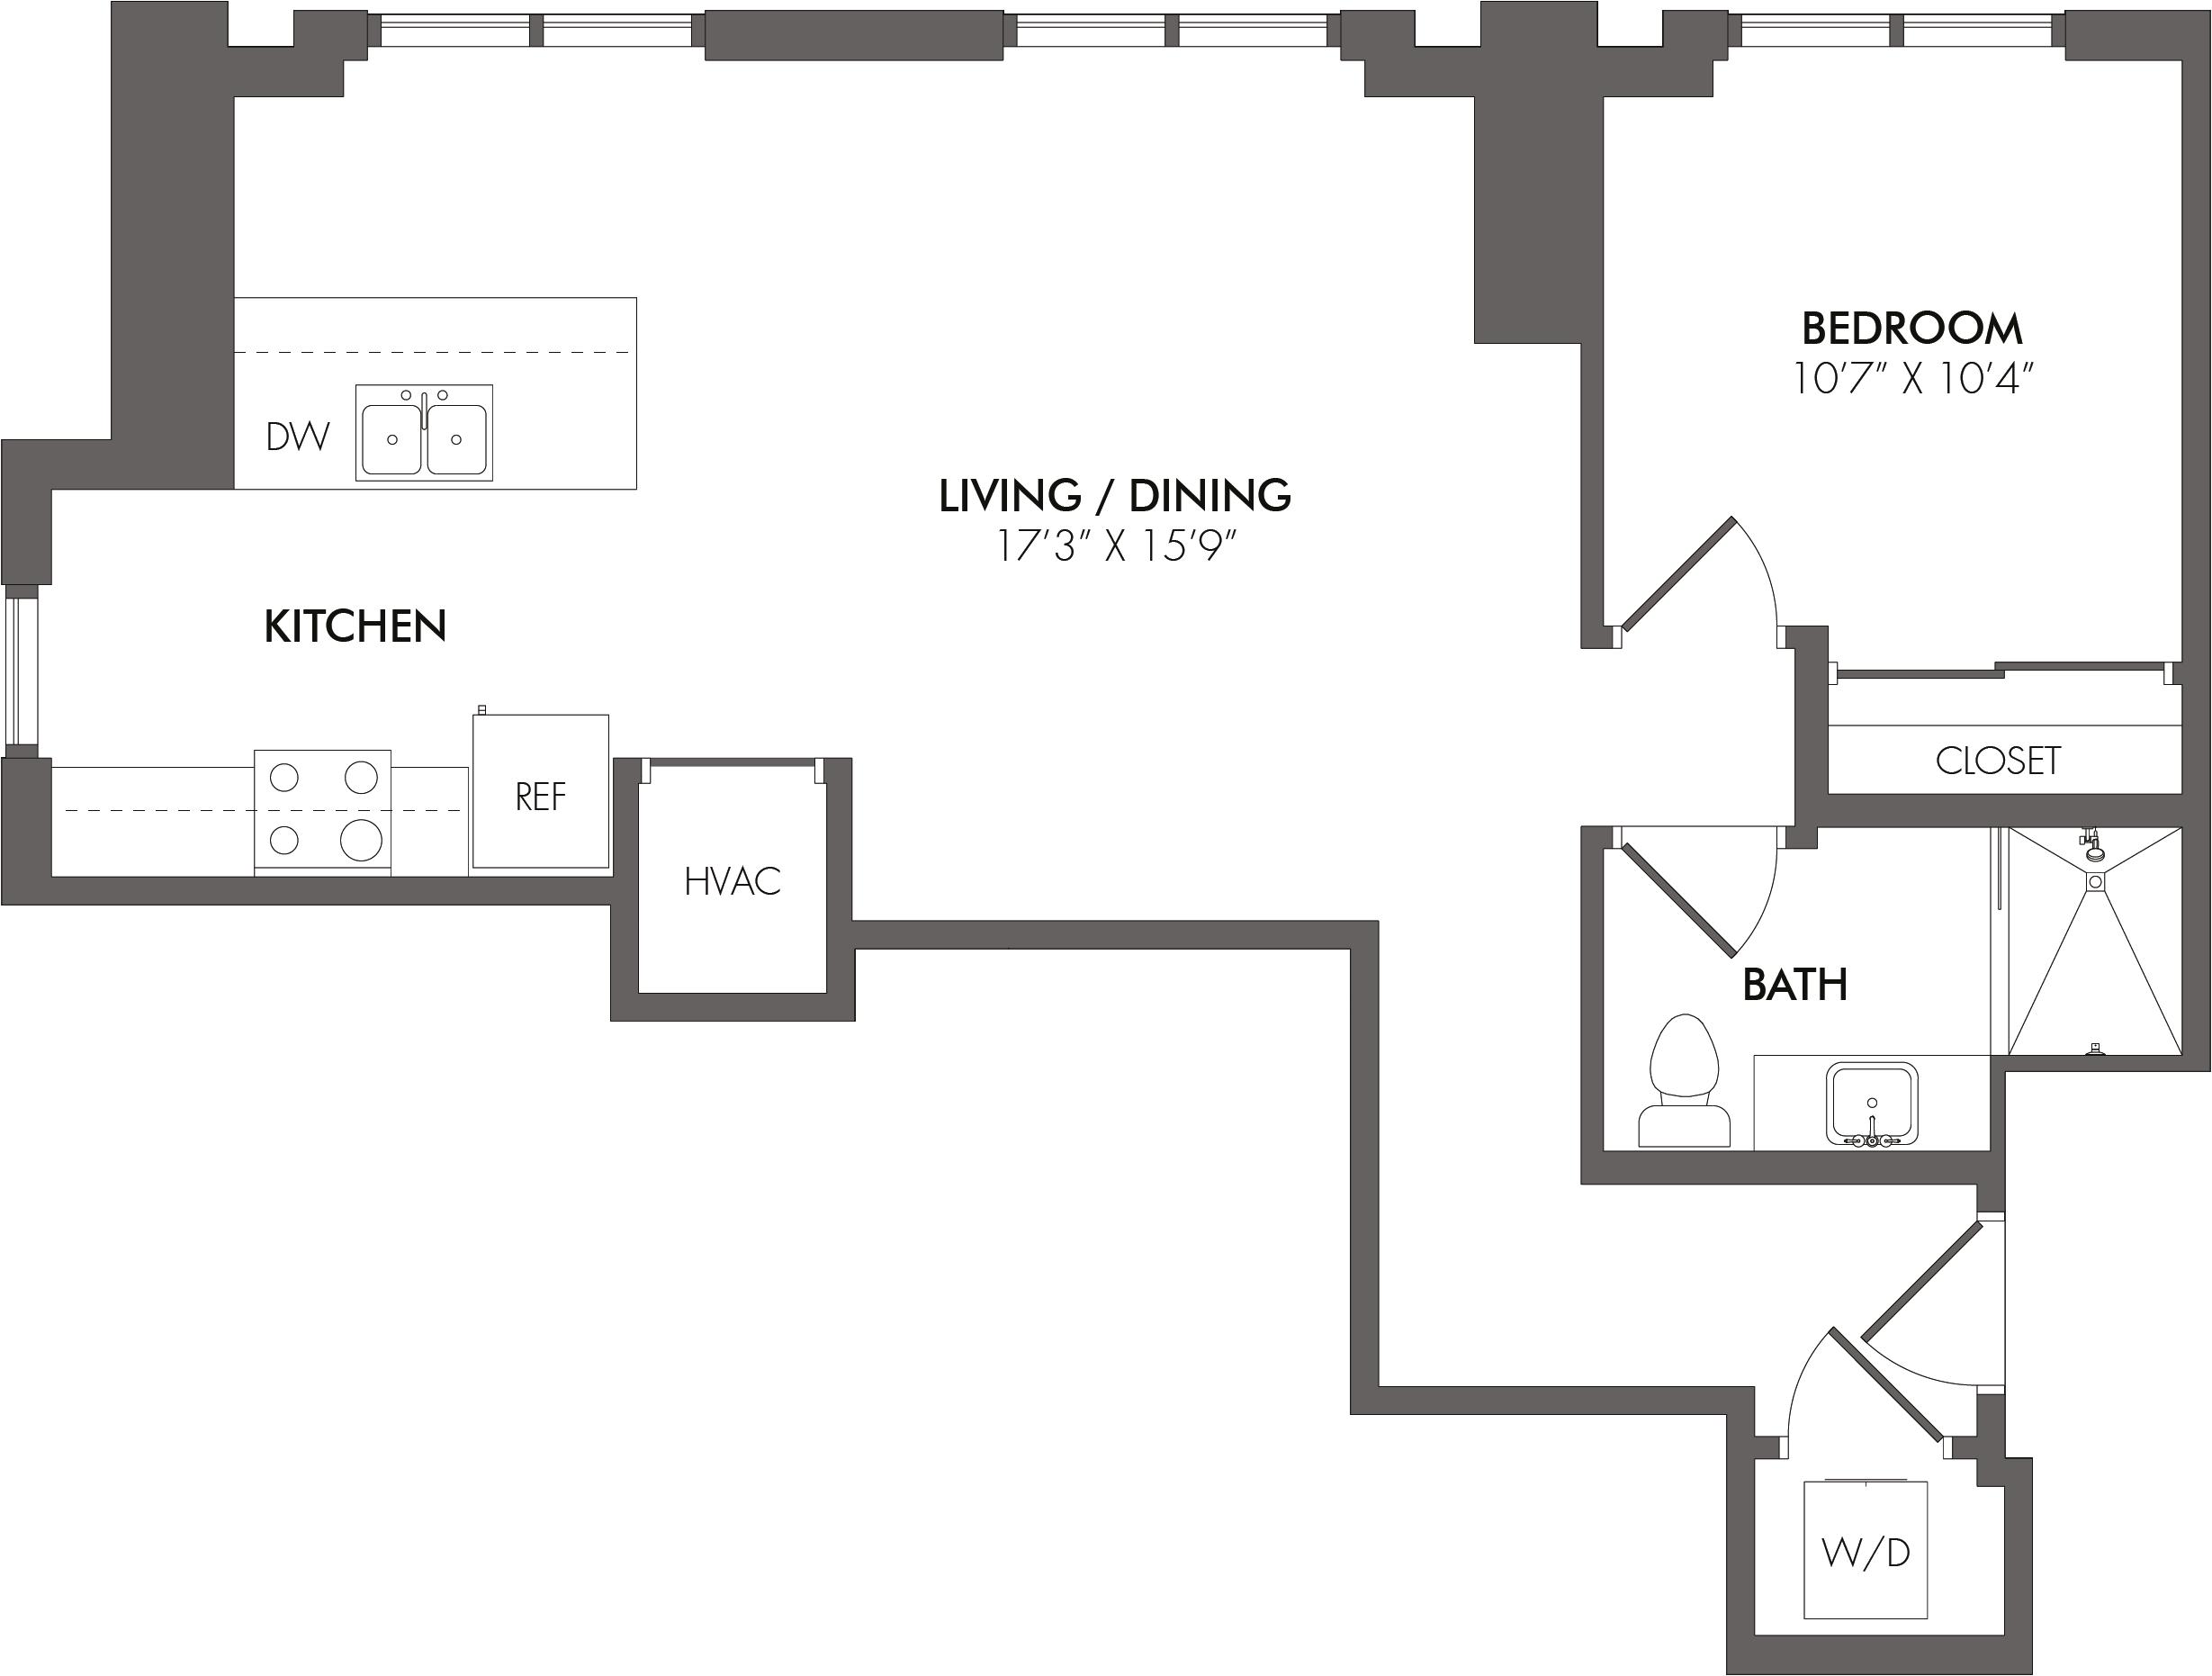 Apartment 3213 floorplan